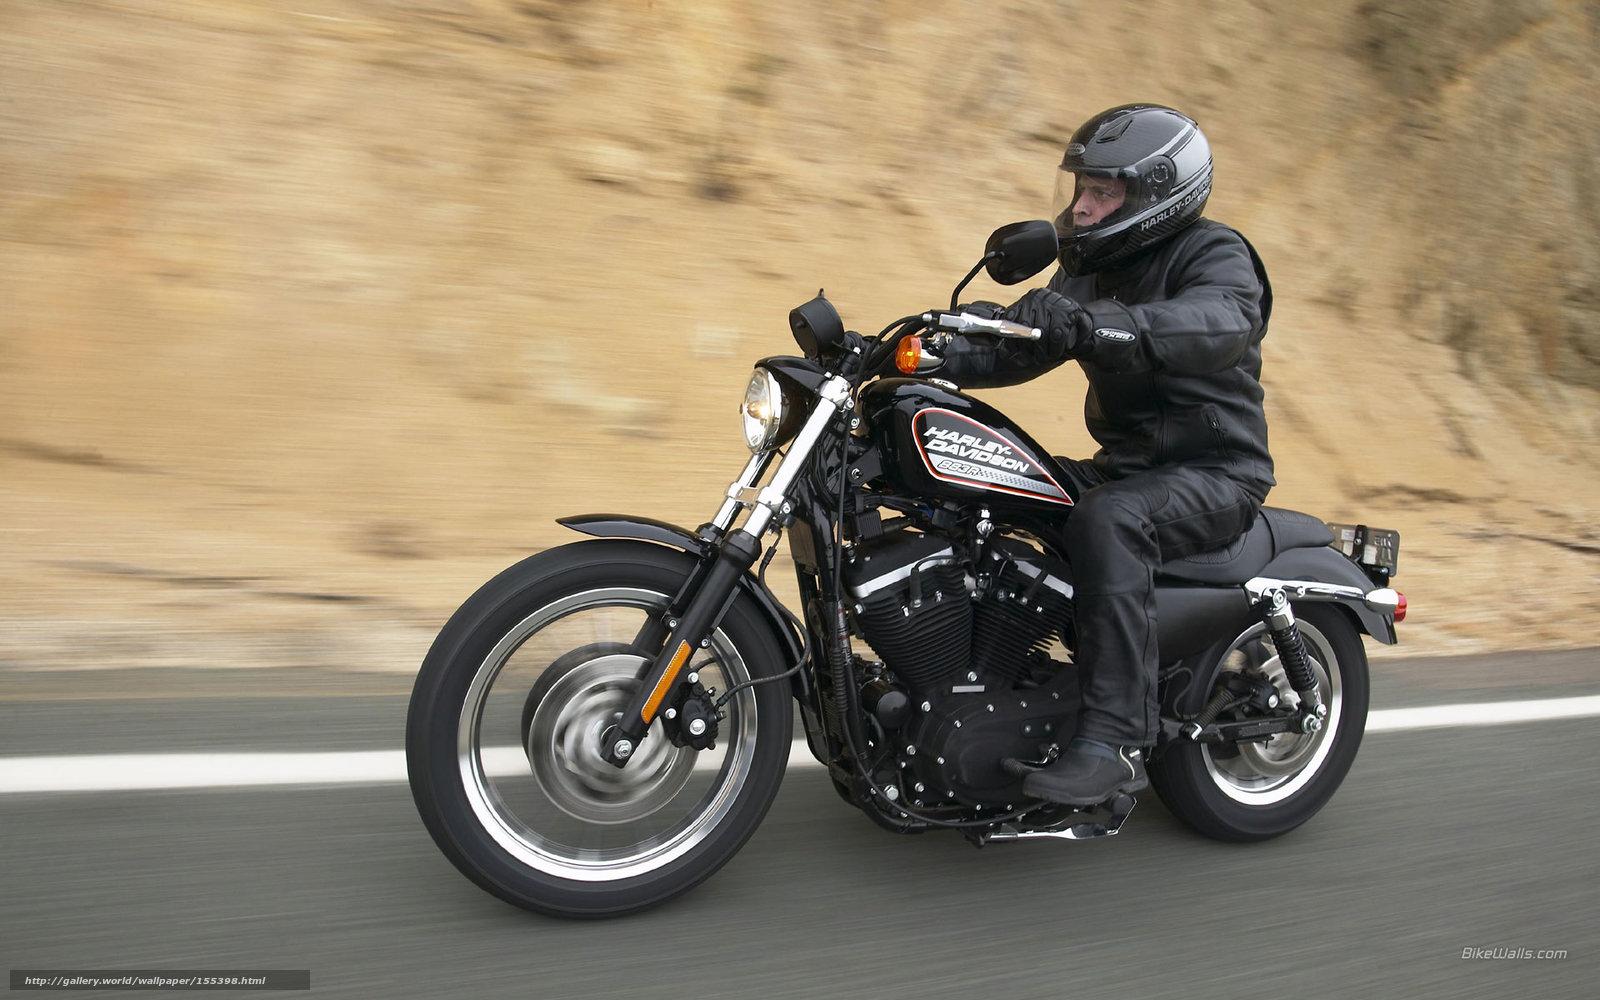 Download wallpaper Harley Davidson Sportster XL 883 R Sportster XL 1600x1000